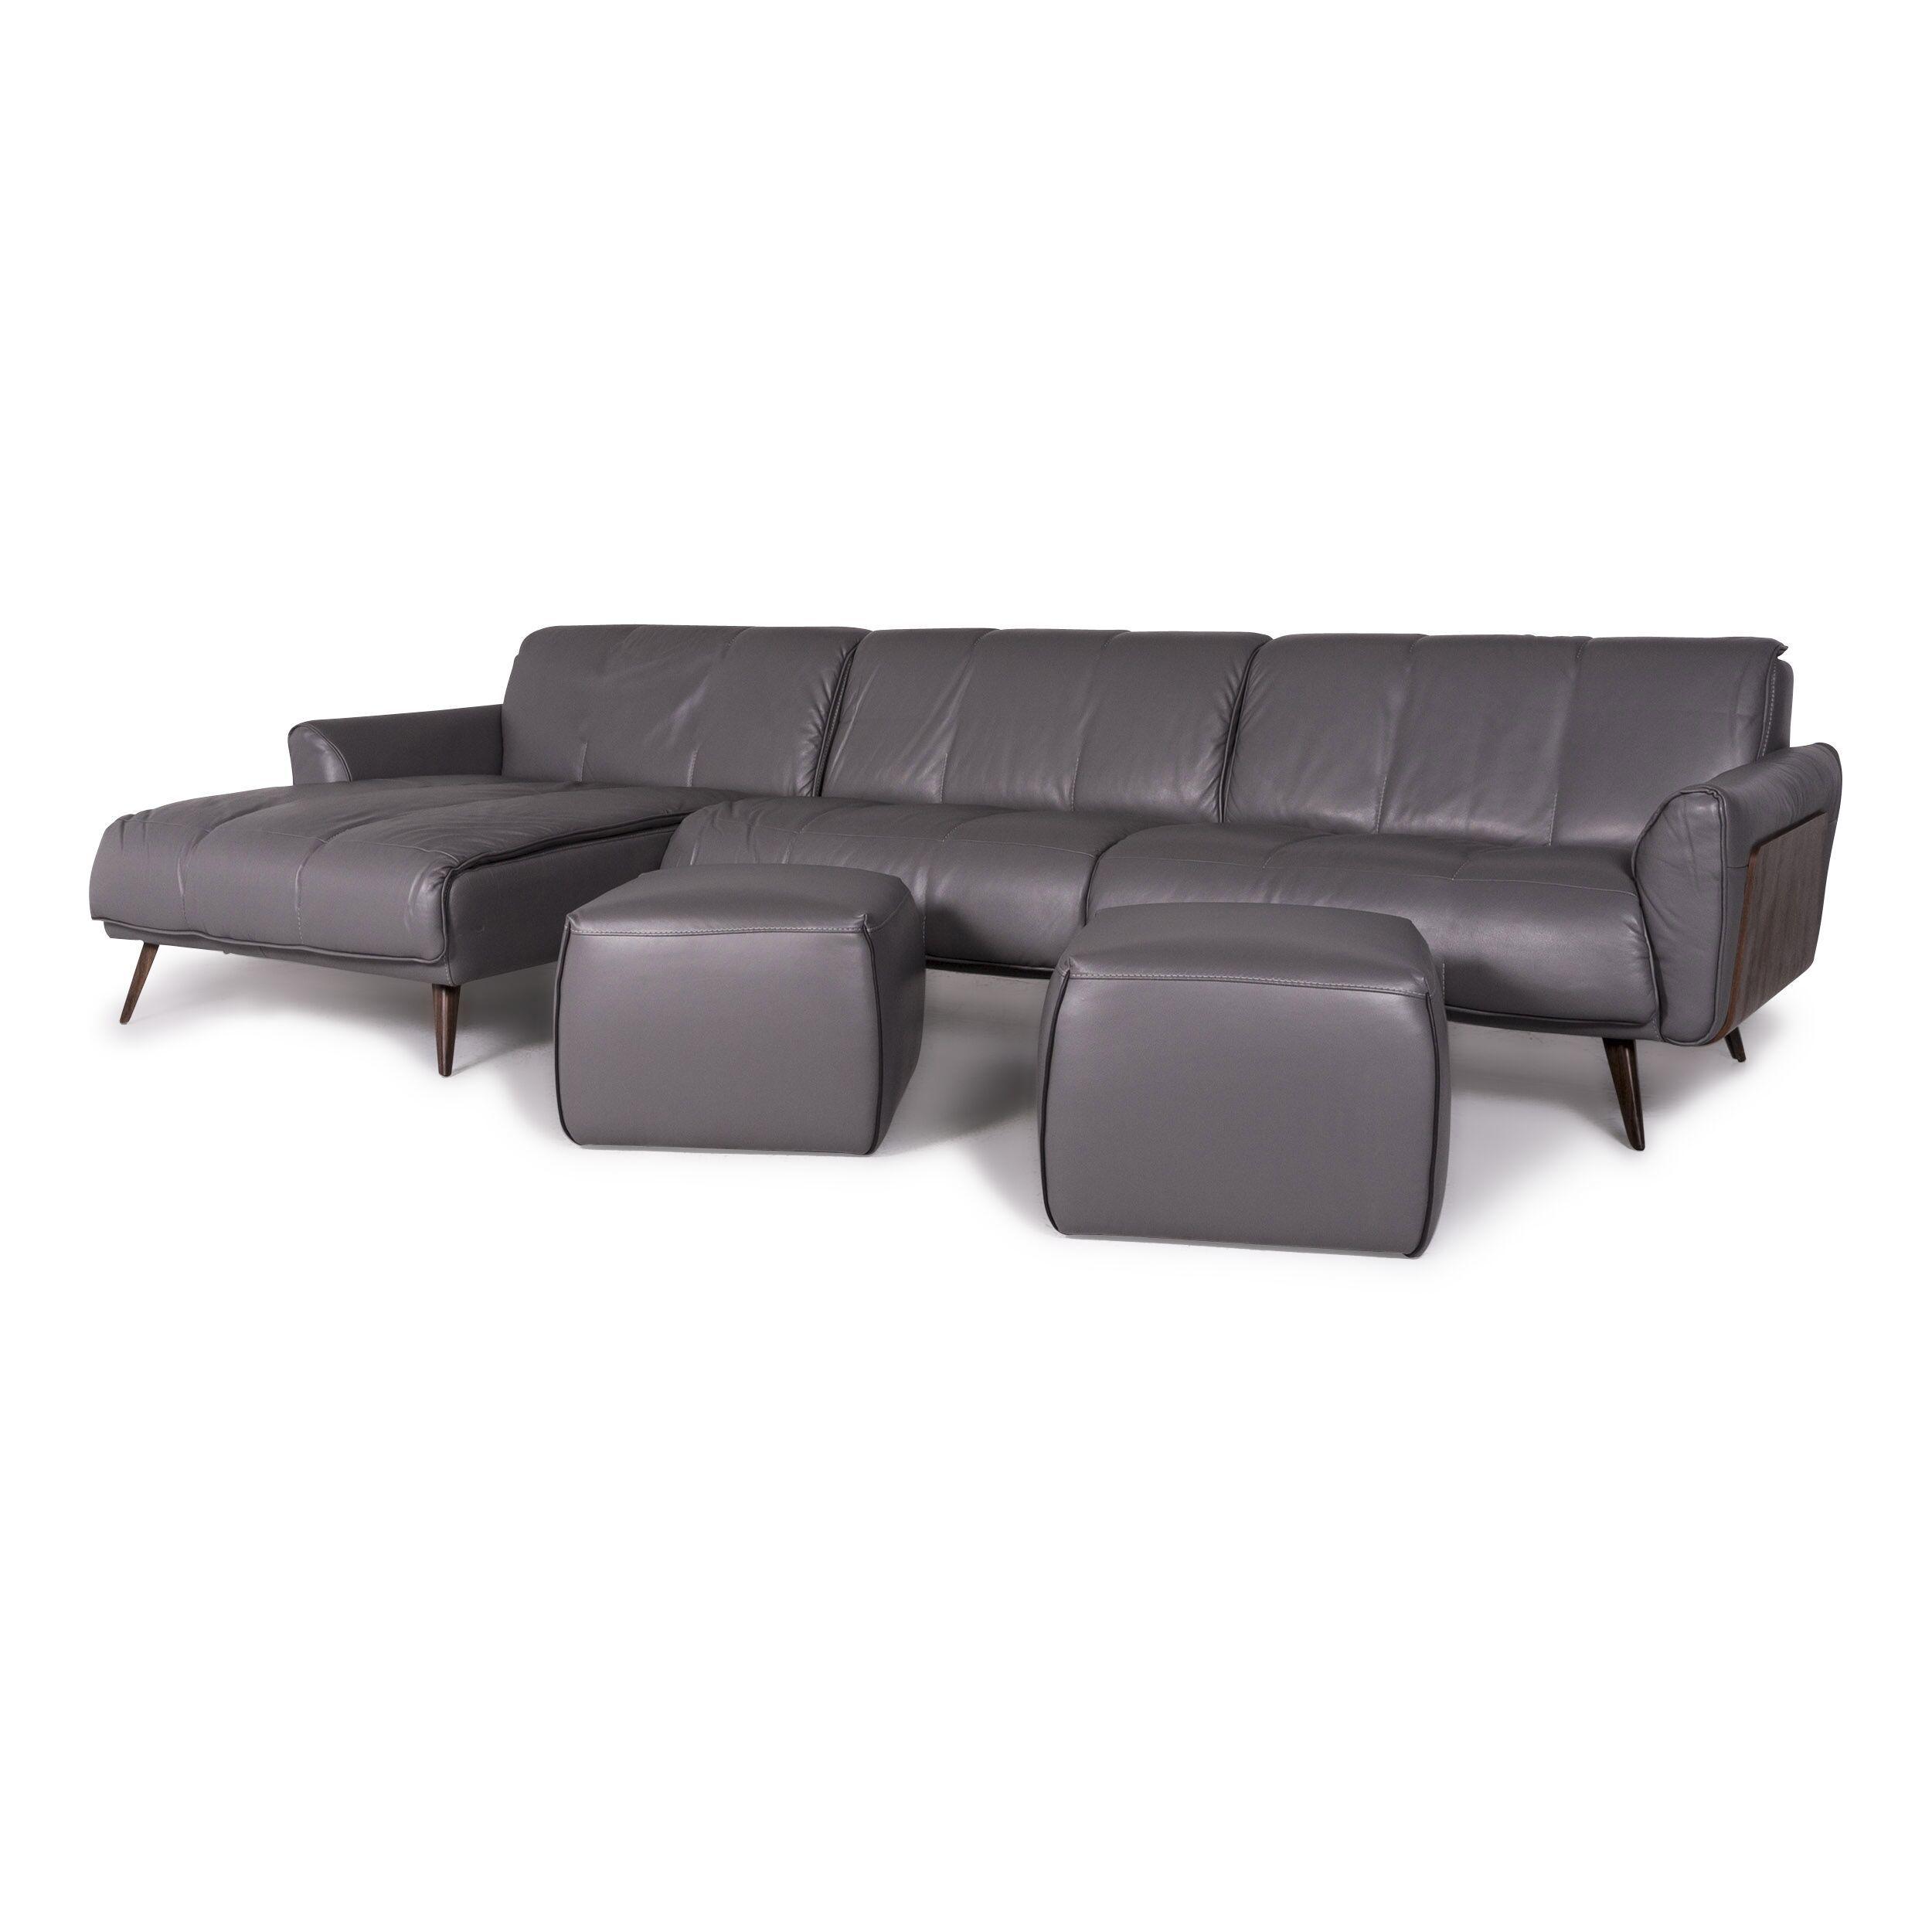 Remarkable Natuzzi Editions Talento Designer Leather Sofa Set Gray 1X Corner Sofa 2X Stool 9438 Pabps2019 Chair Design Images Pabps2019Com